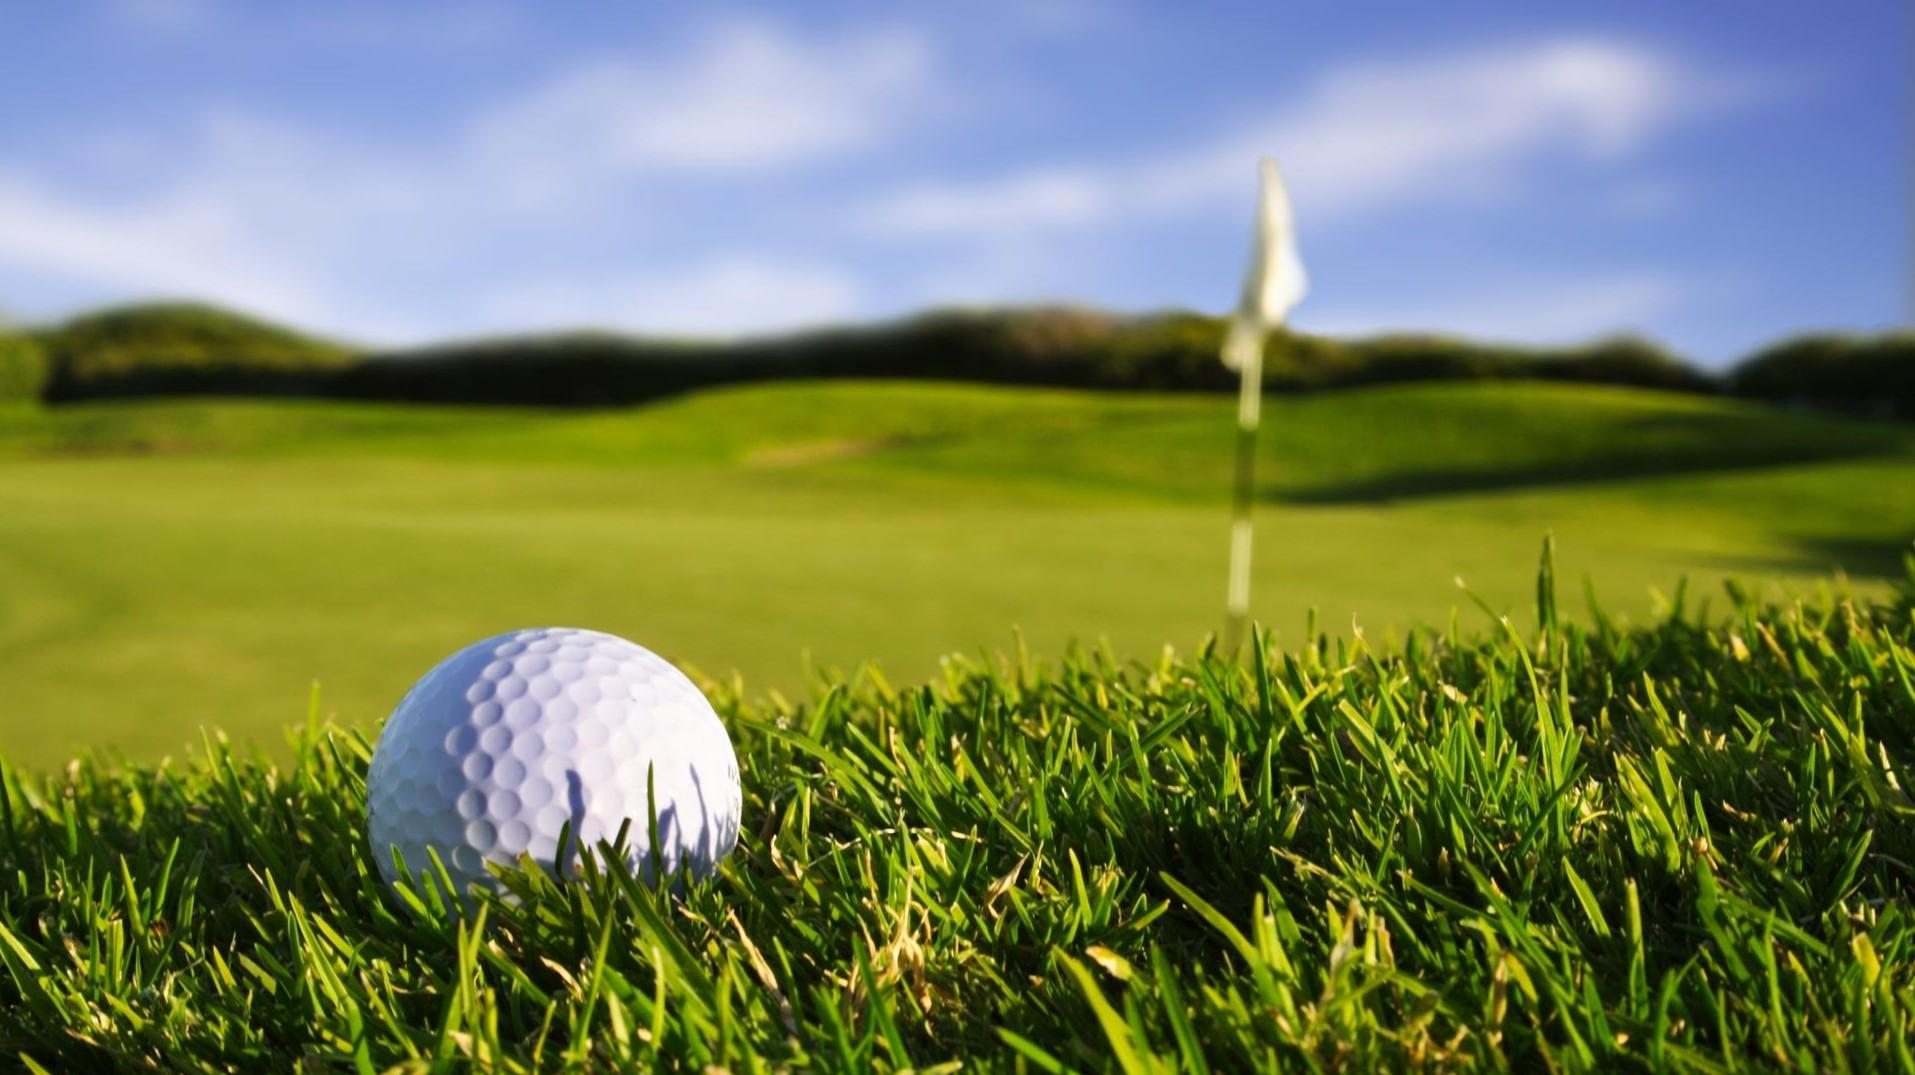 Examples of needing golf insurance